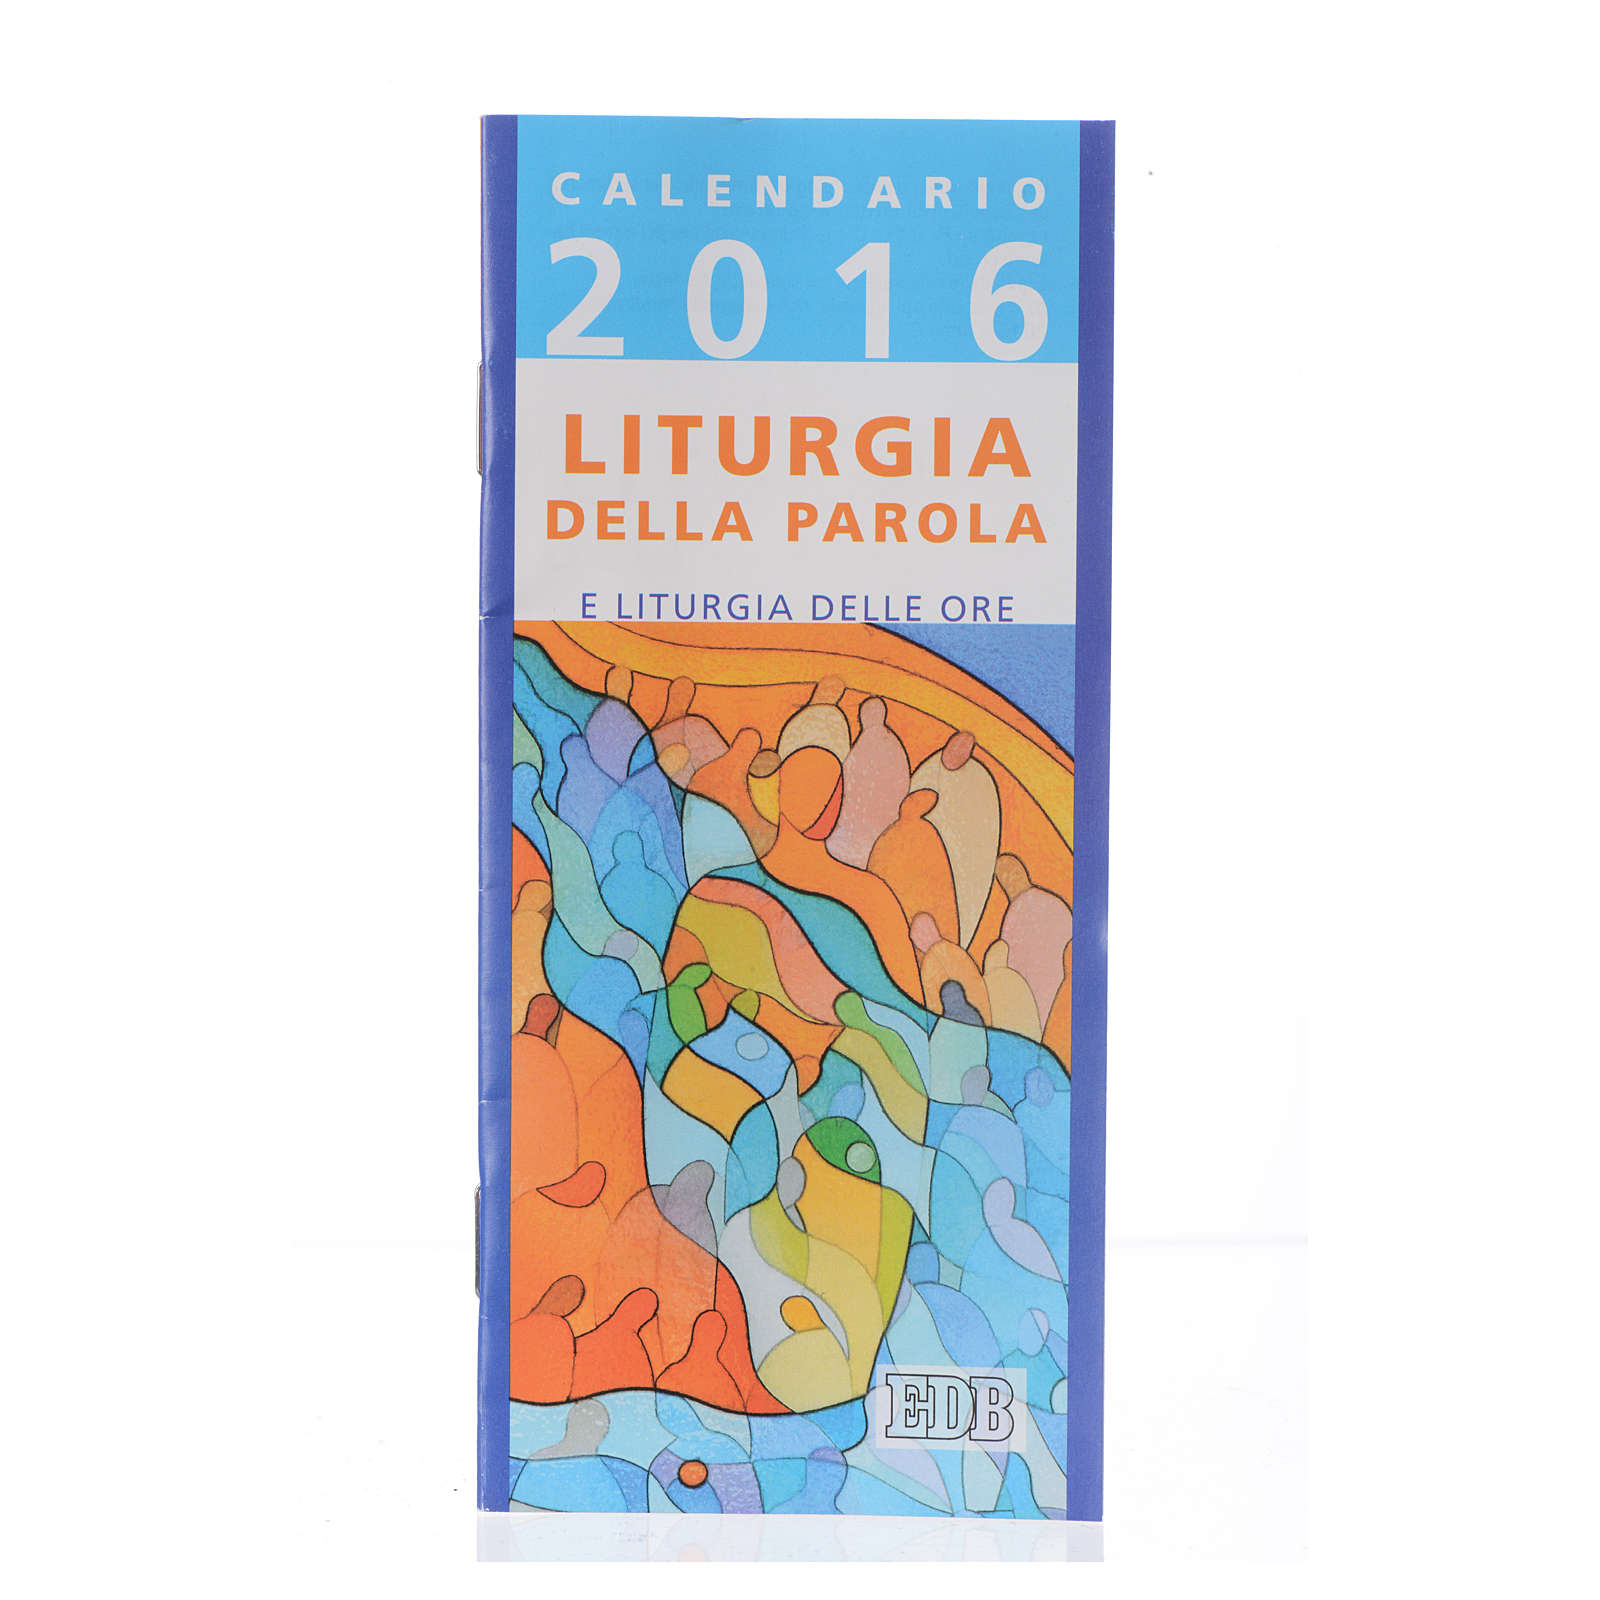 Calendario liturgico 2016 ed. Dehoniane 4